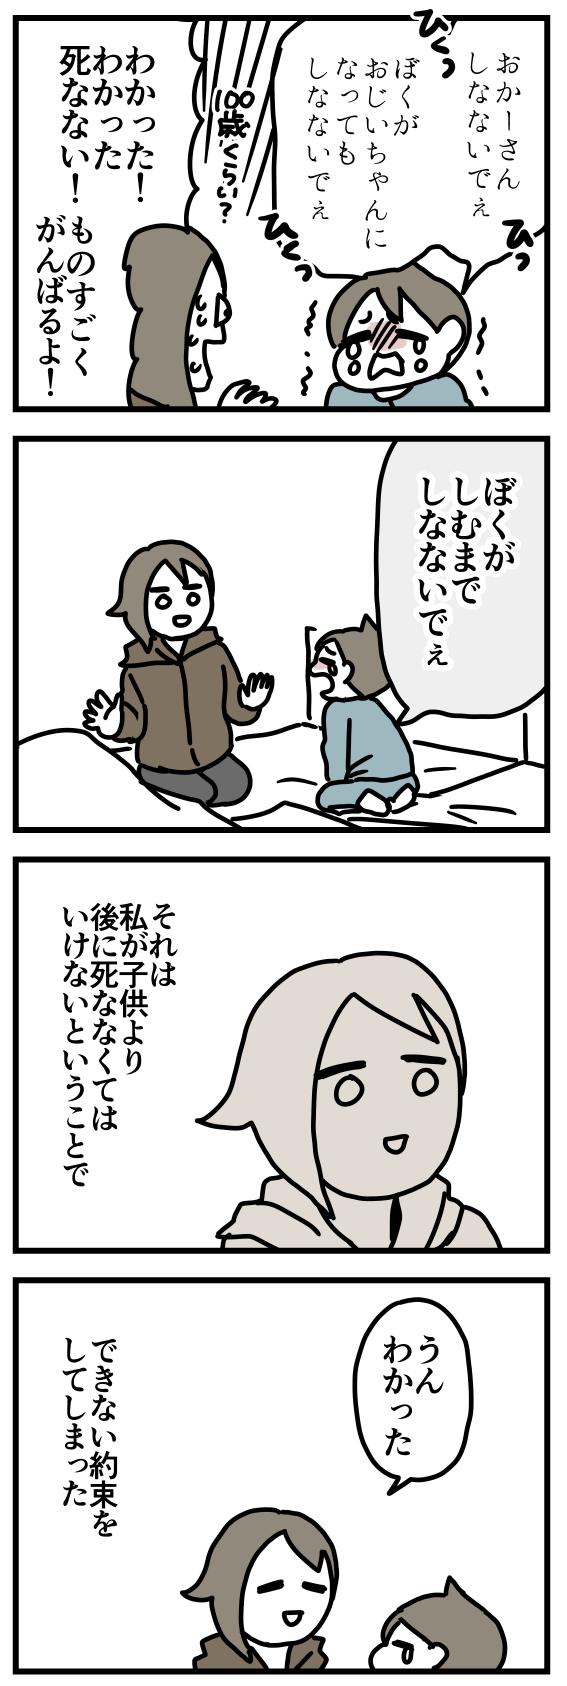 f:id:kanemotonomukuu:20171003150142j:plain